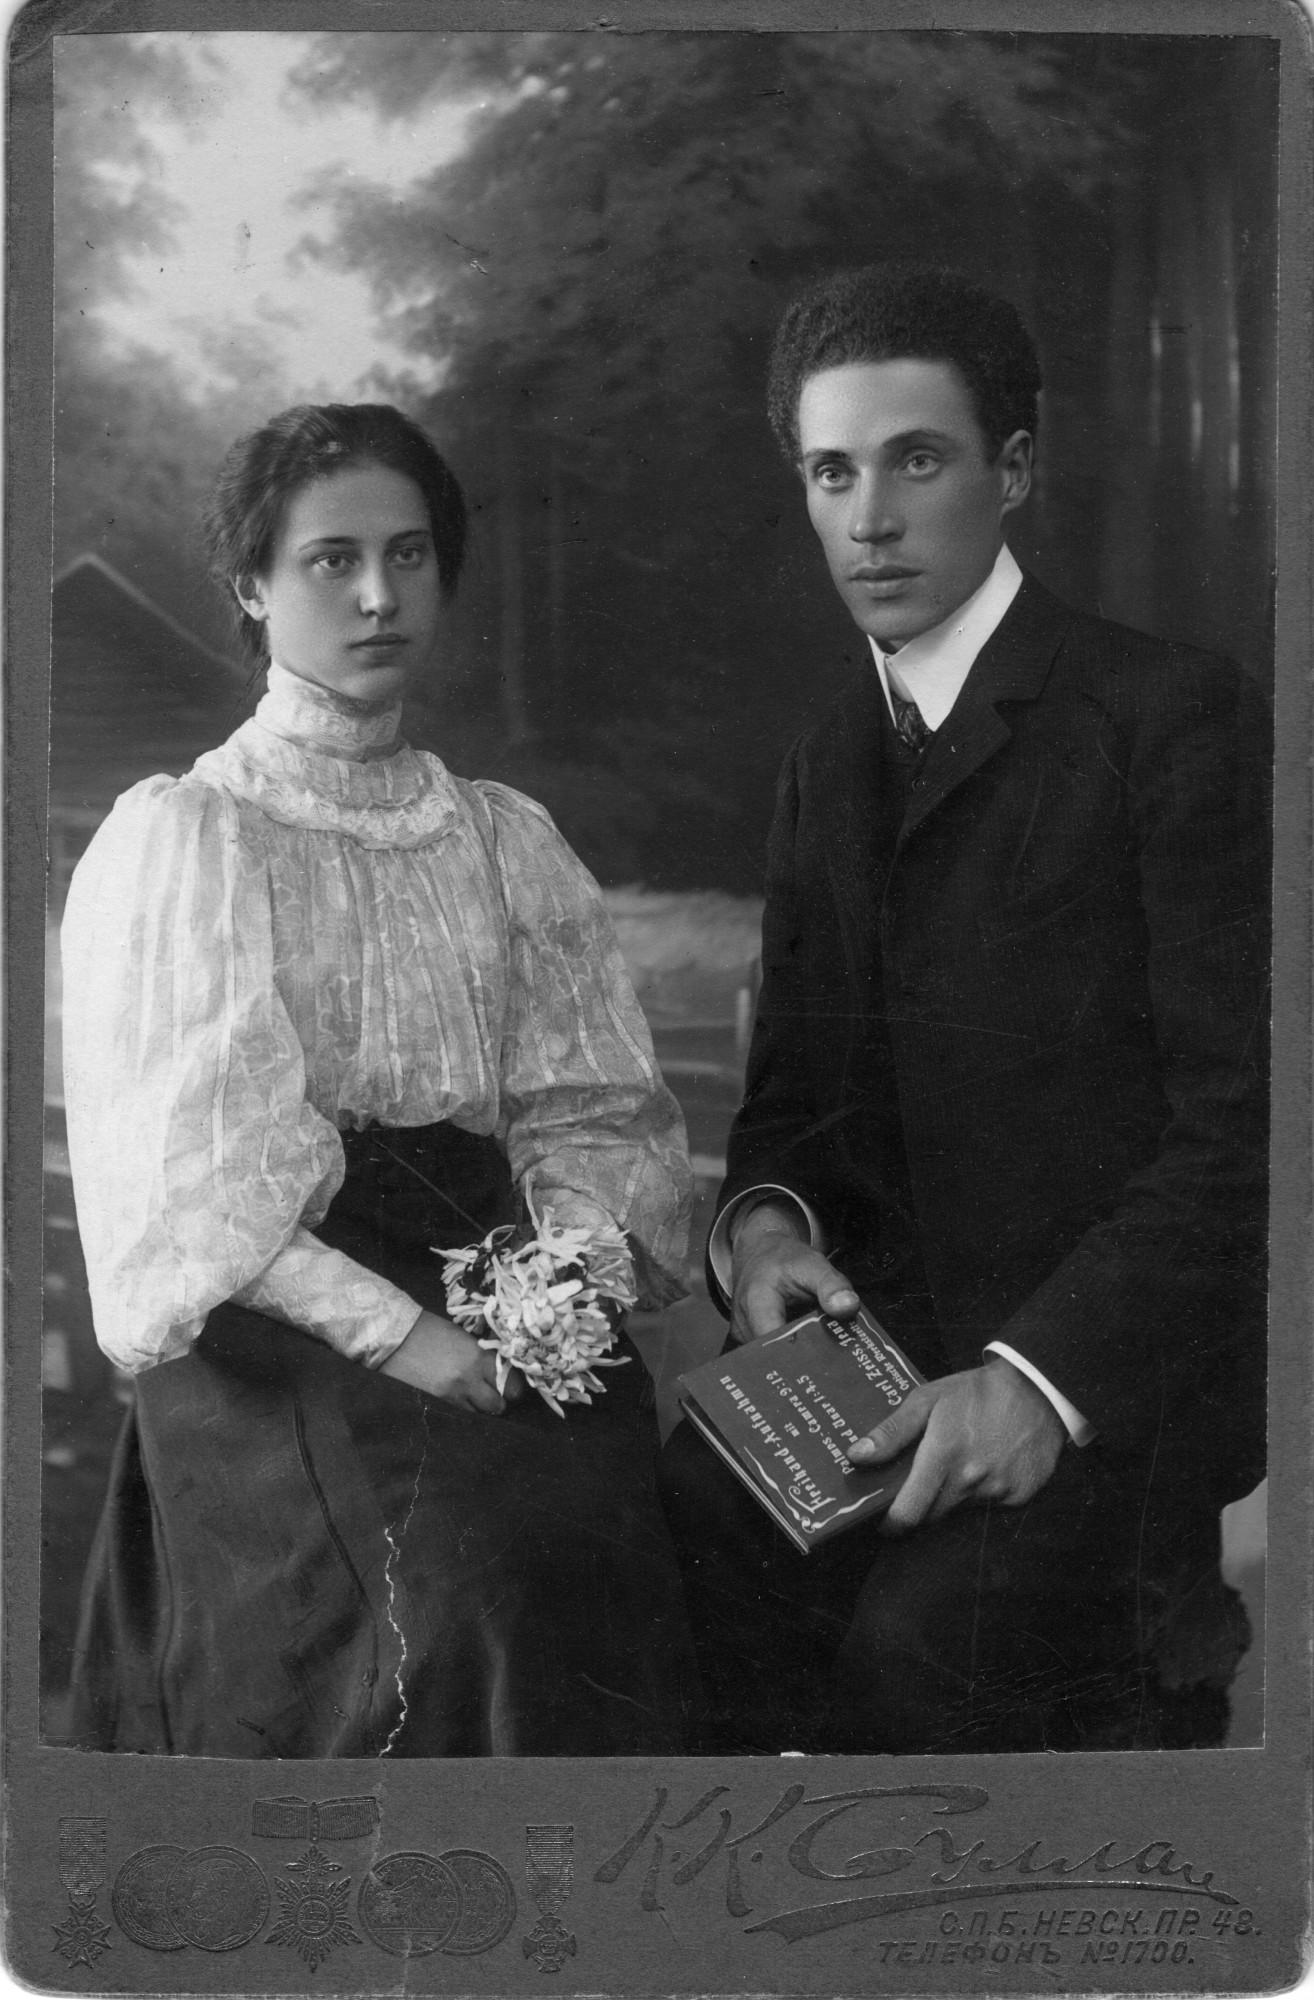 Алфей Петрович Дадаев и его жена Зинаида Фёдоровна, урождённая Кокорева. 1905-6 г.